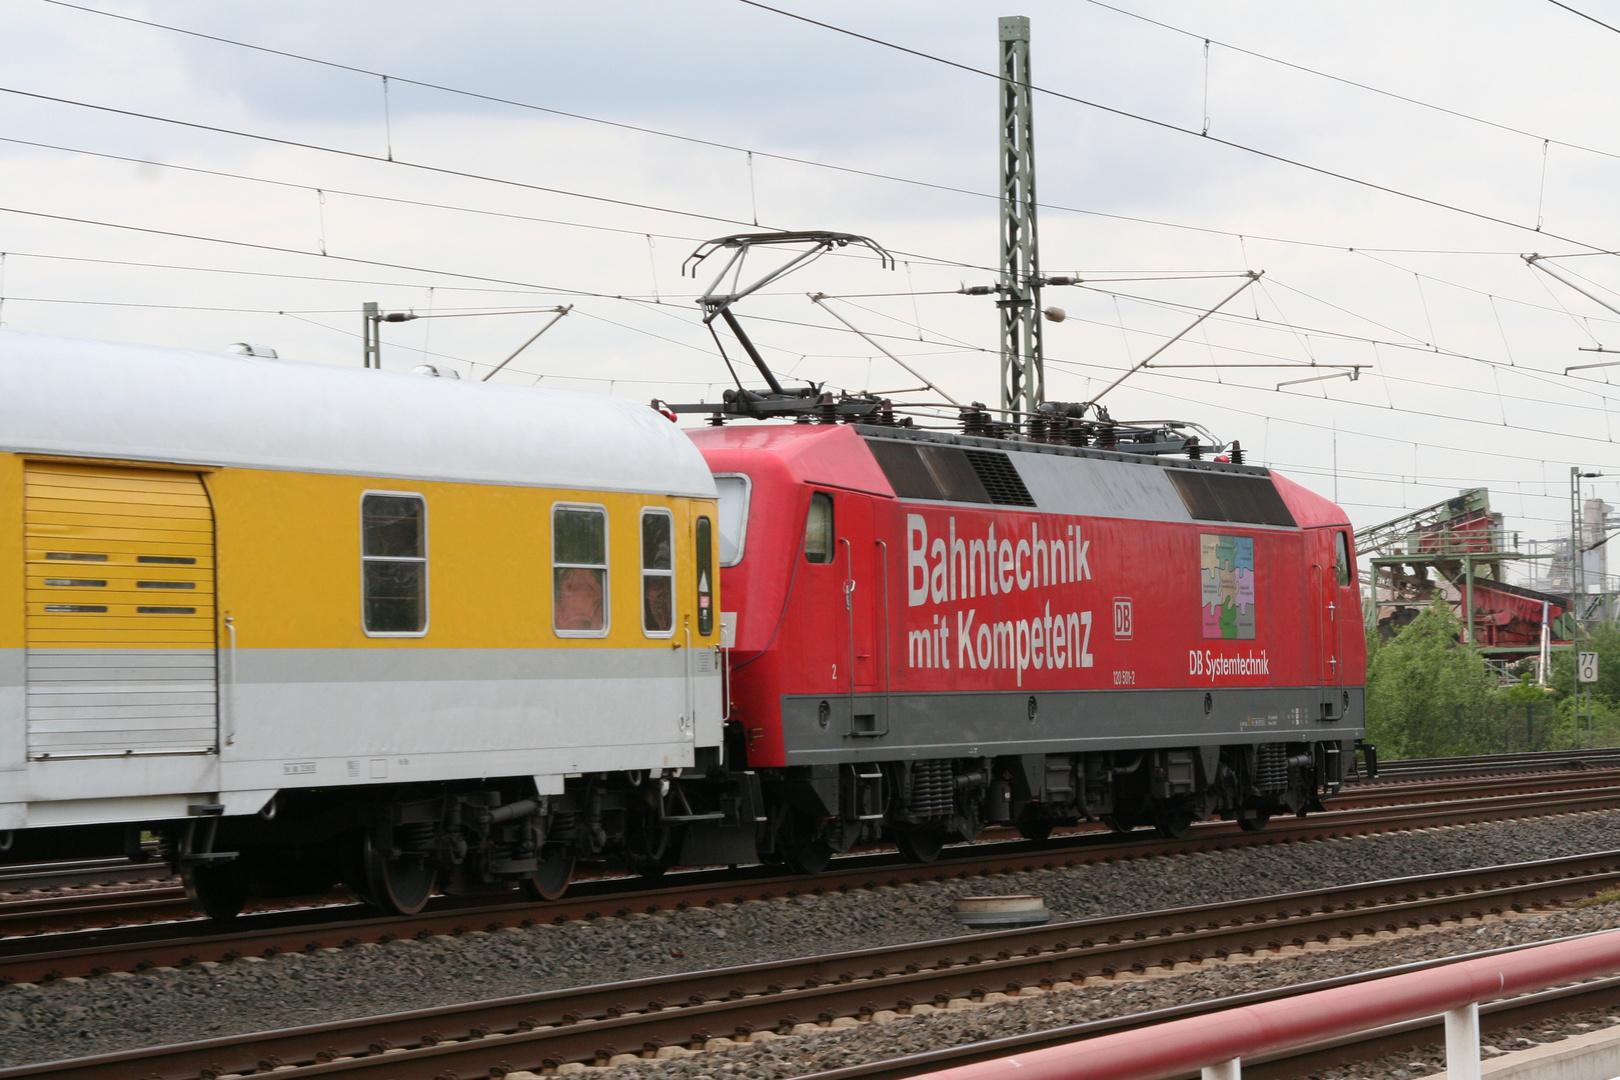 120 501-2 Bahntechnik mit Kompetenz